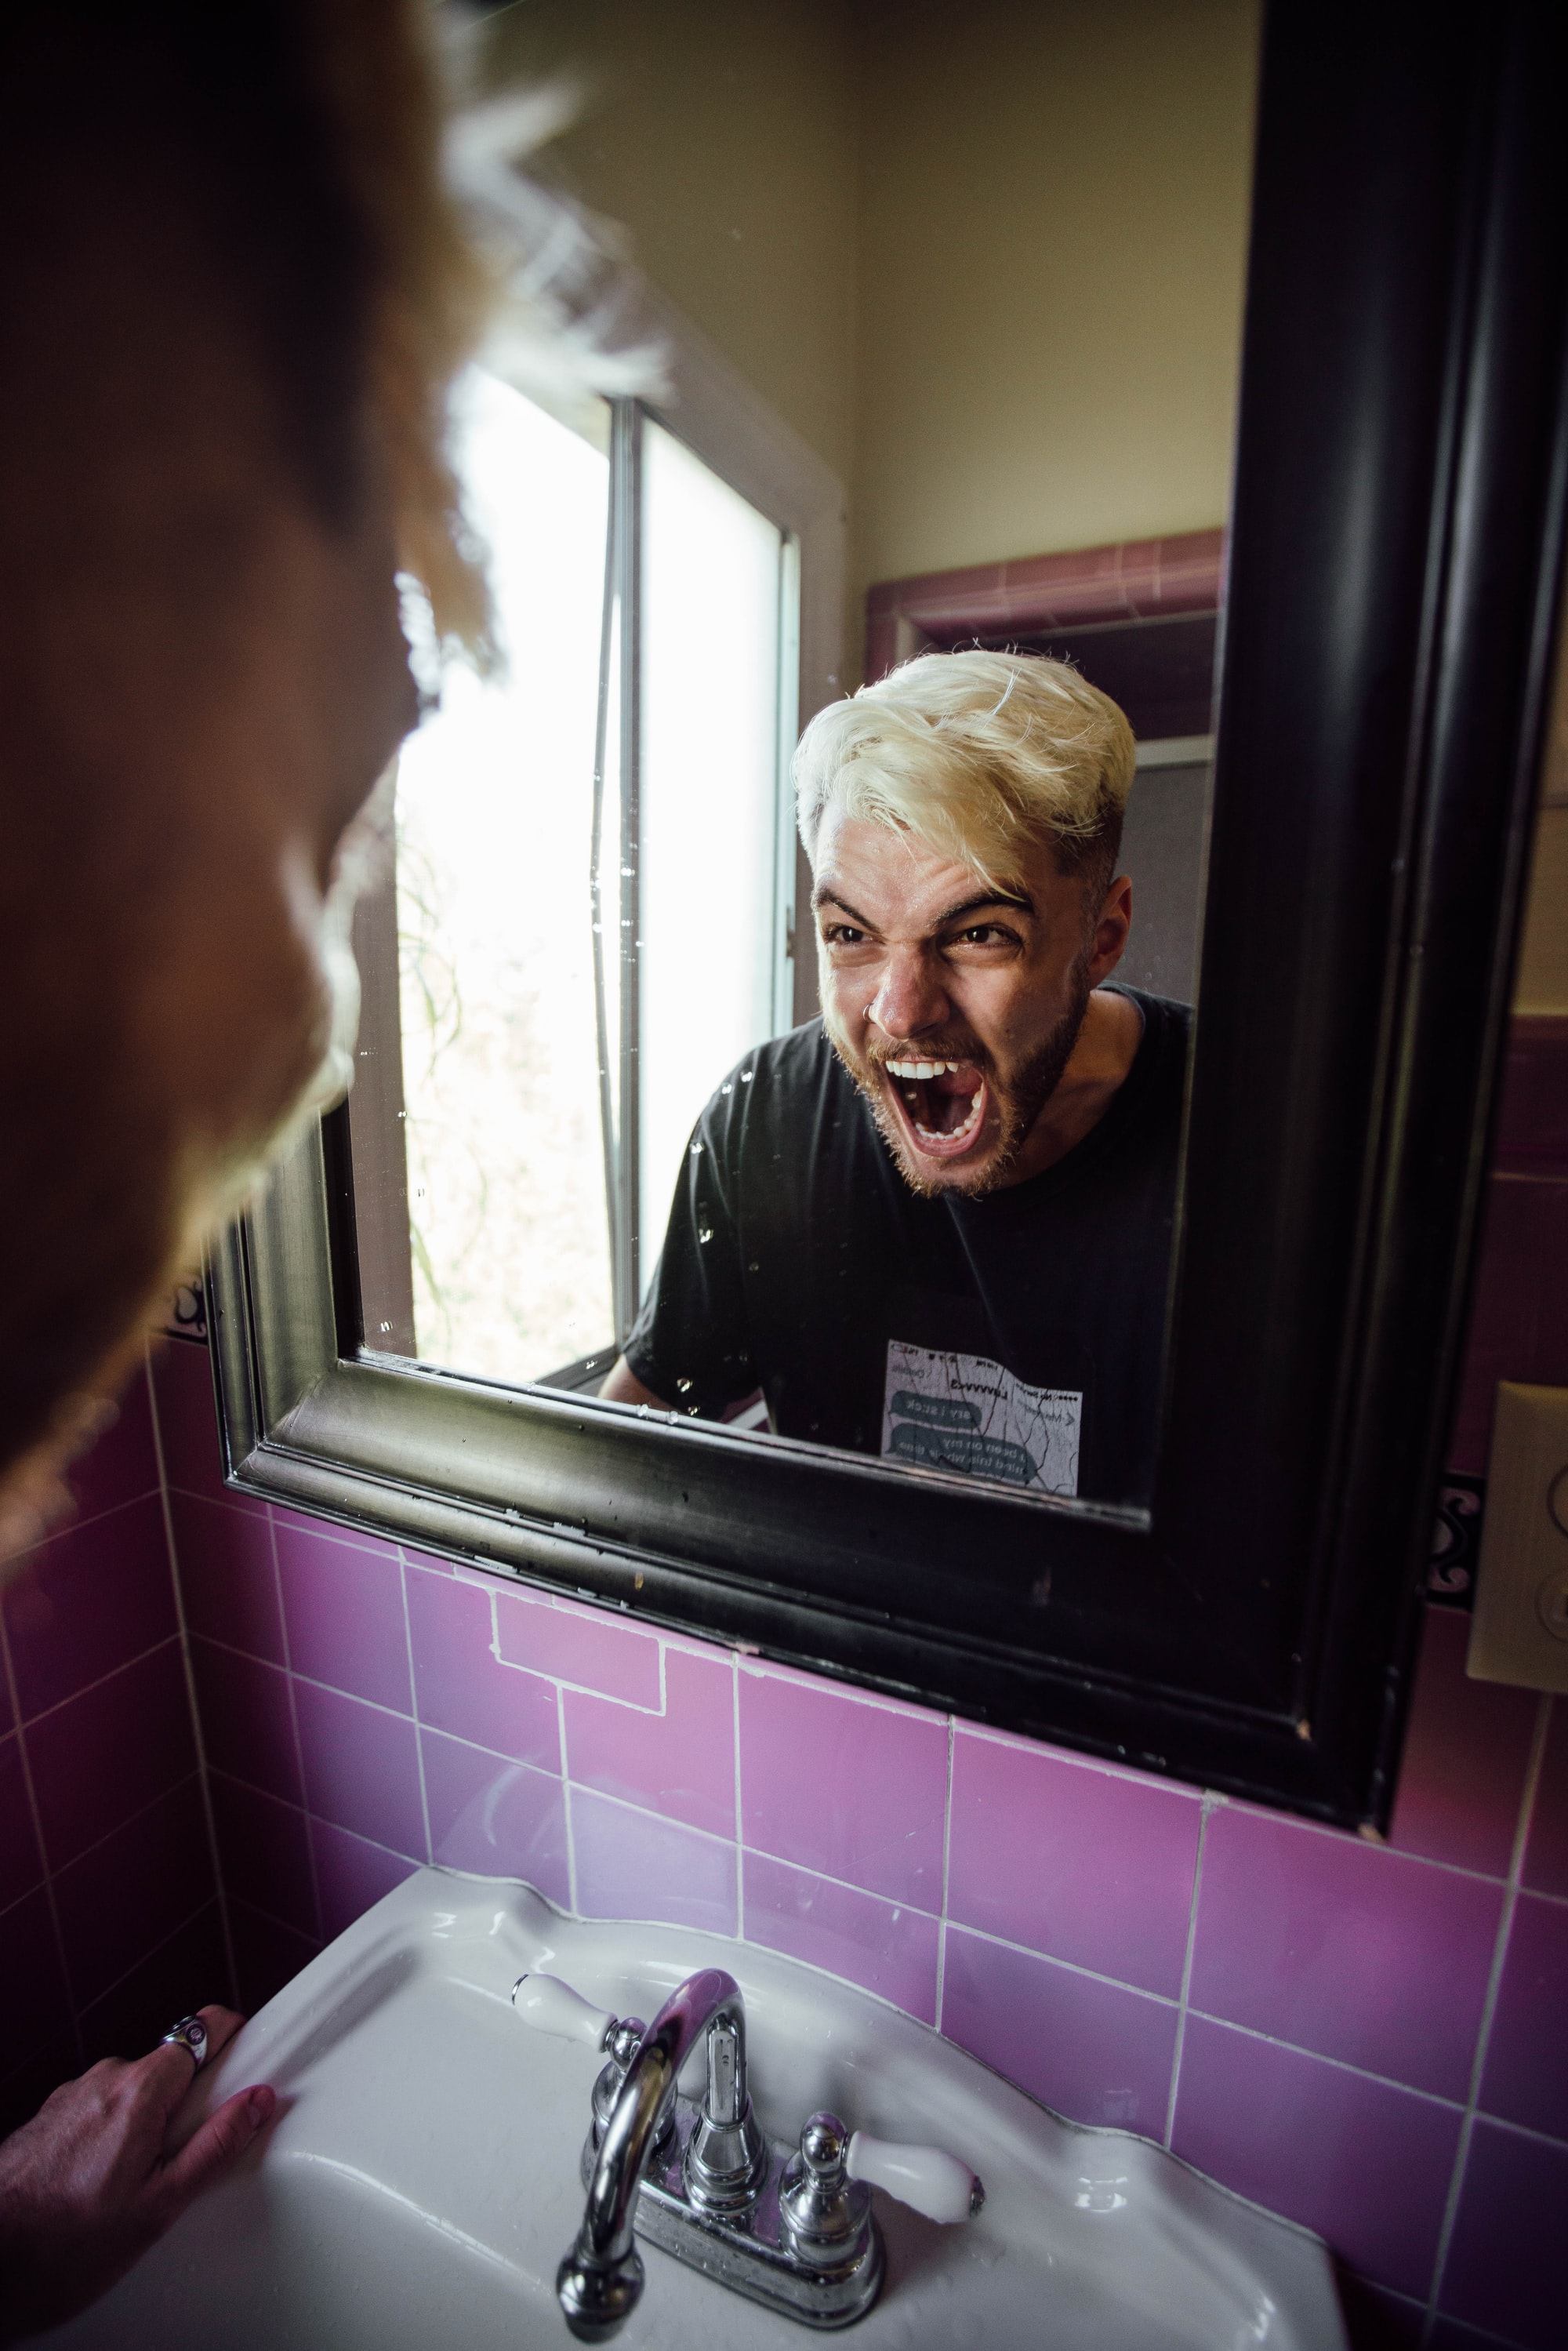 Man screaming at himself in the bathroom.